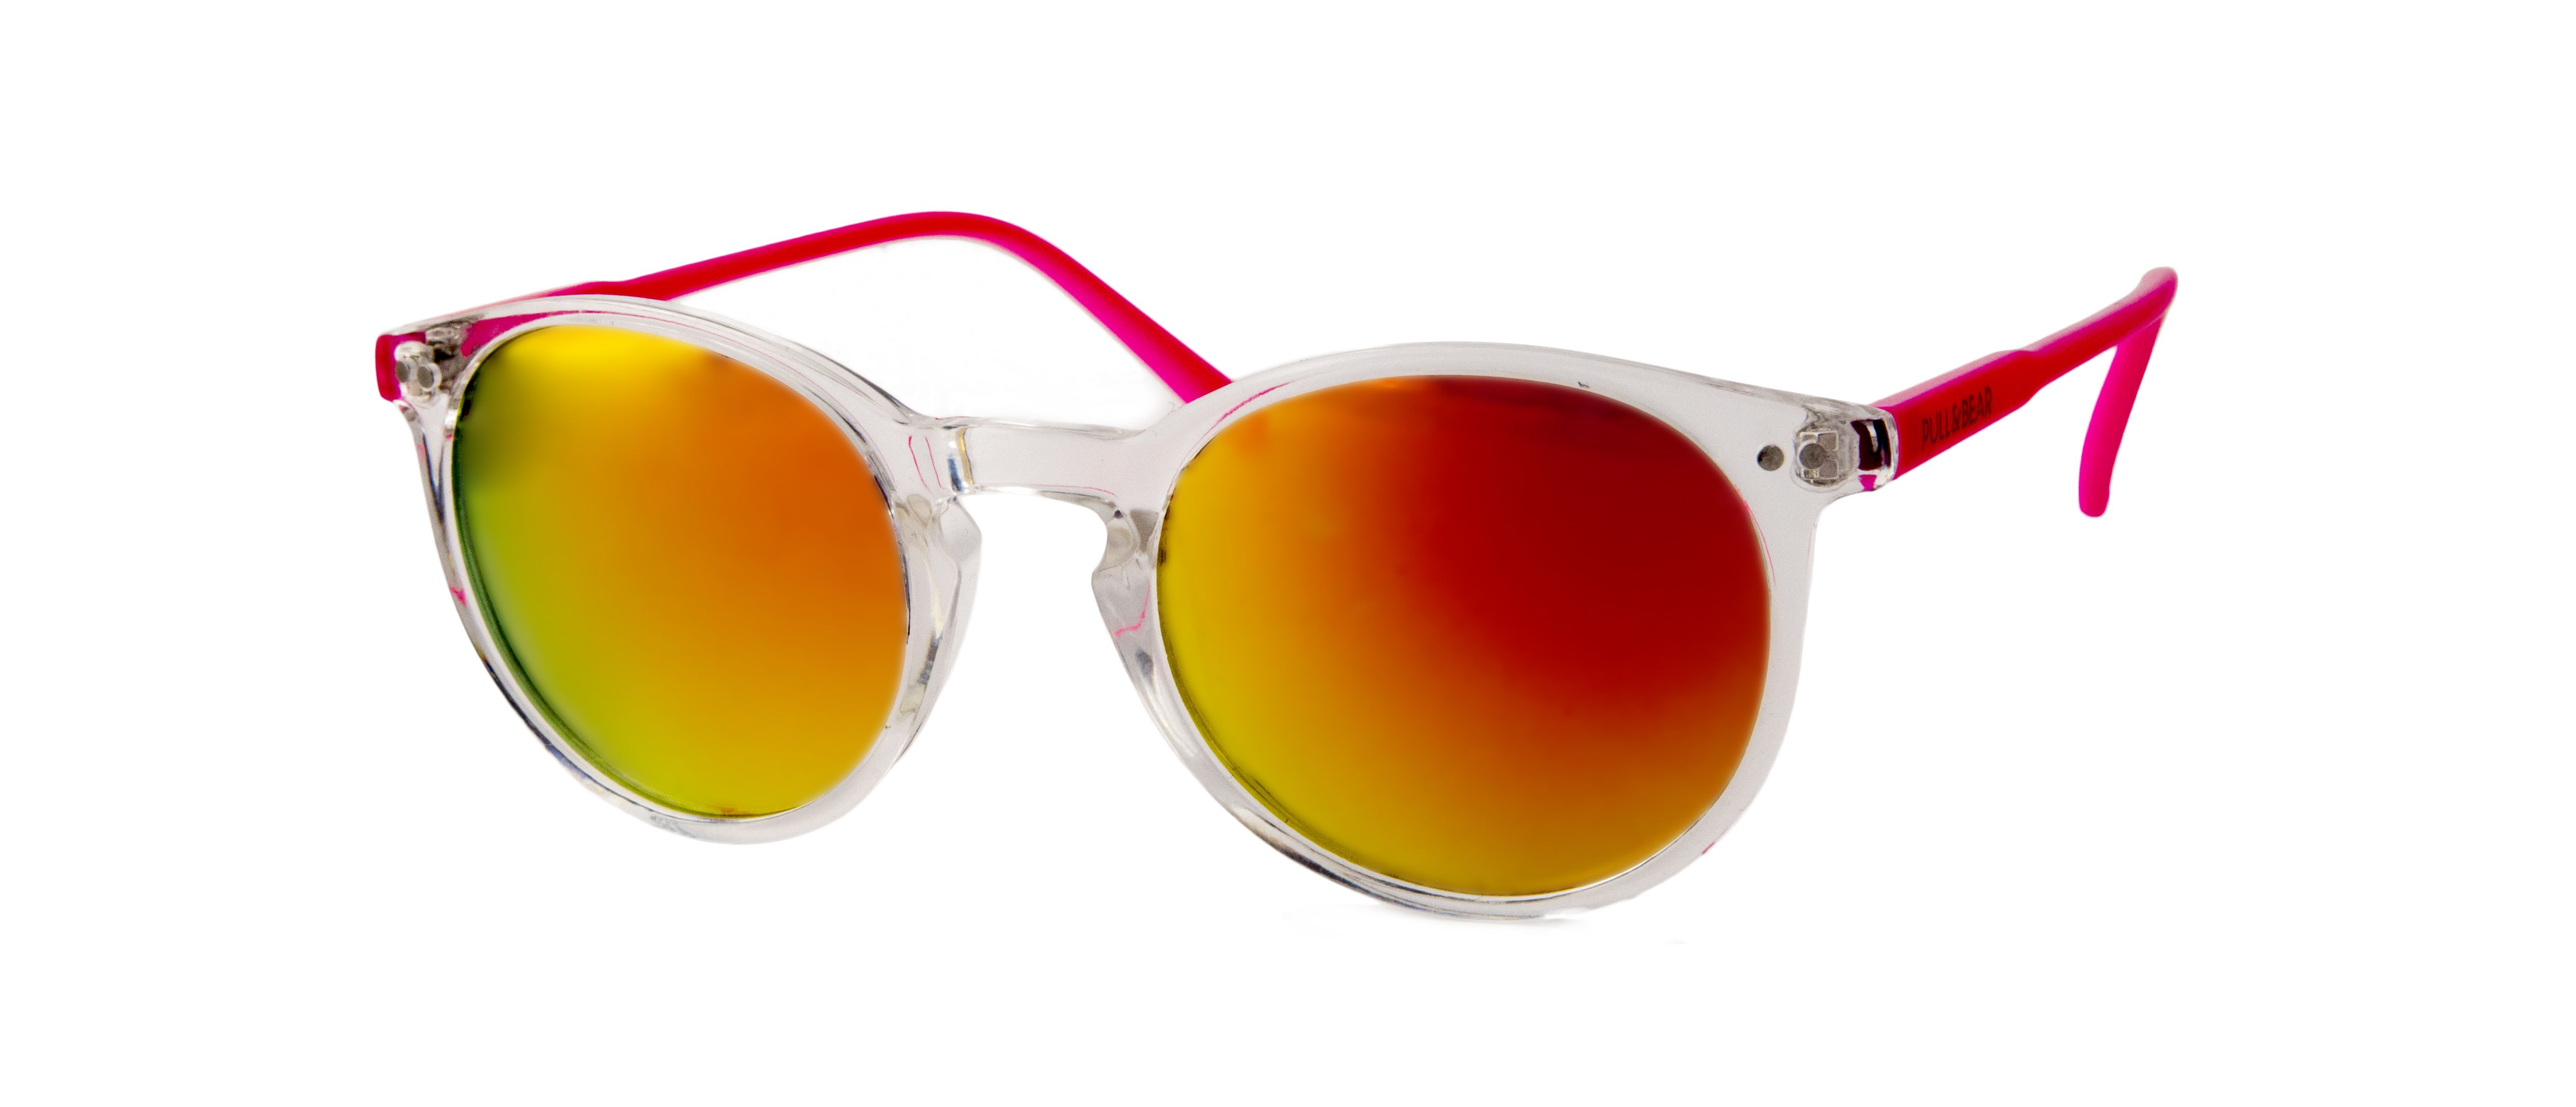 OpticaliaUn Look De amp;bear Para Gafas Pull Sol WD2YEHI9